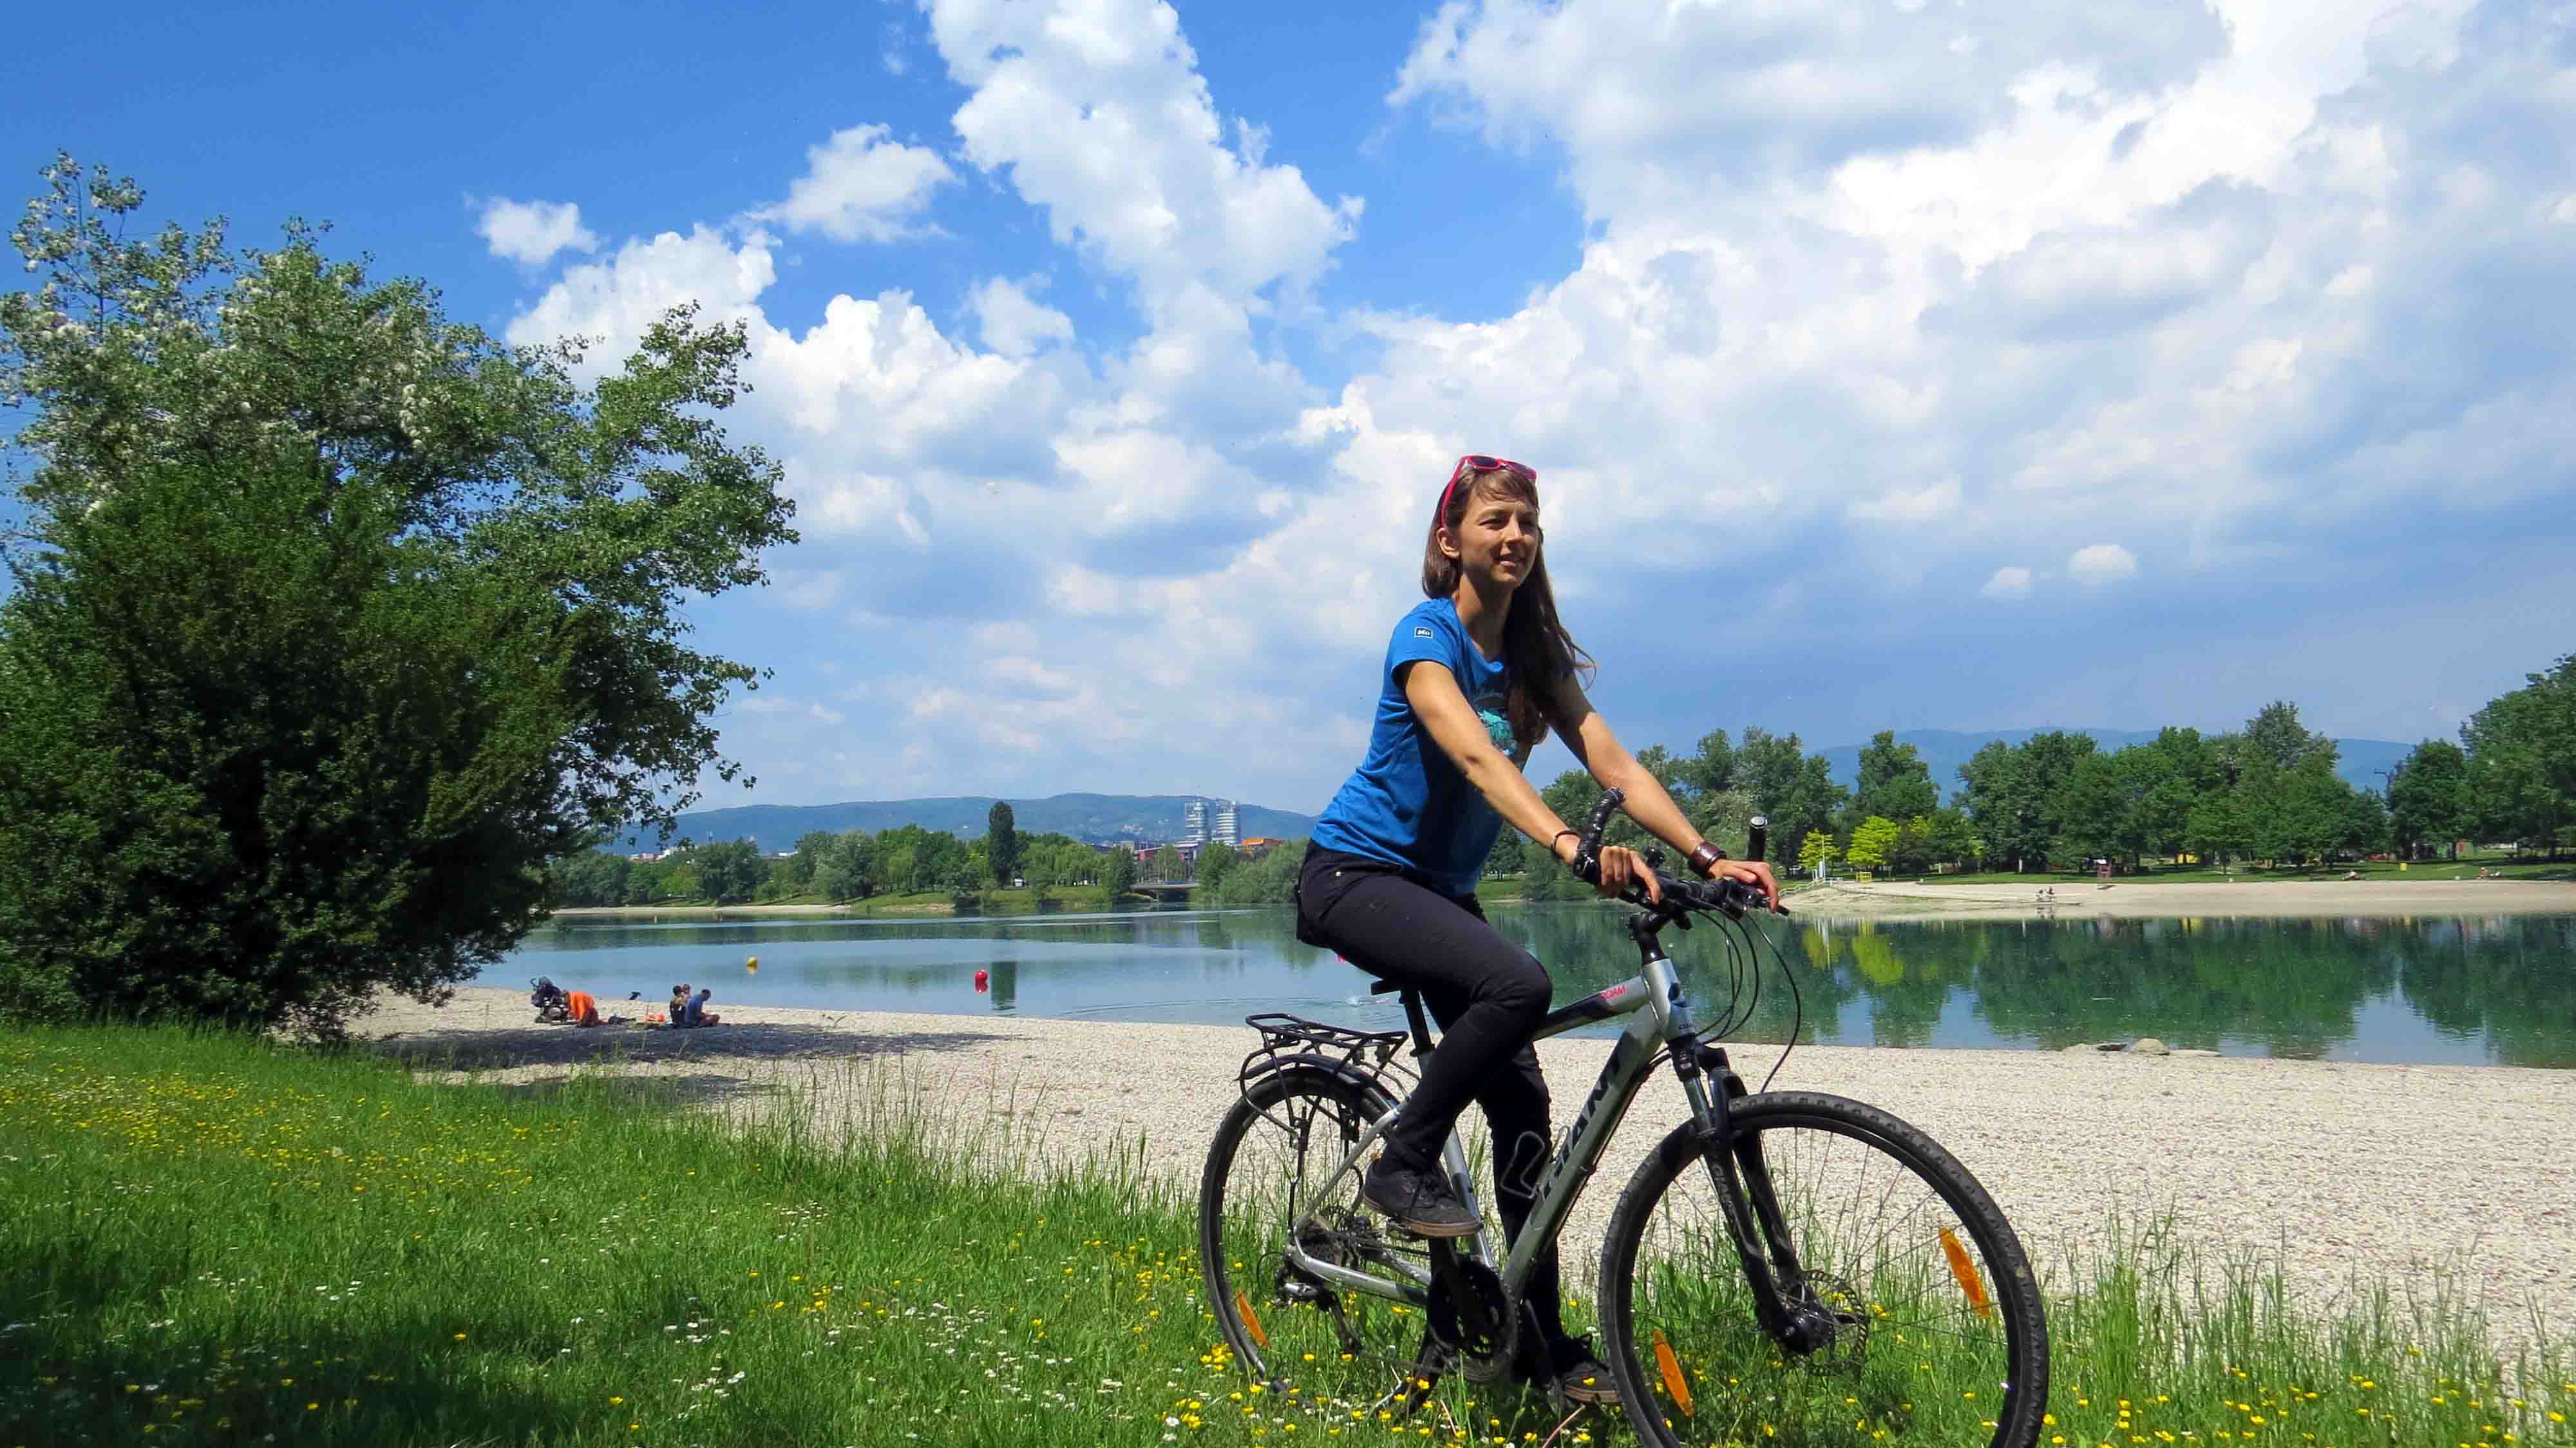 Zagreb Radtour und Kanu